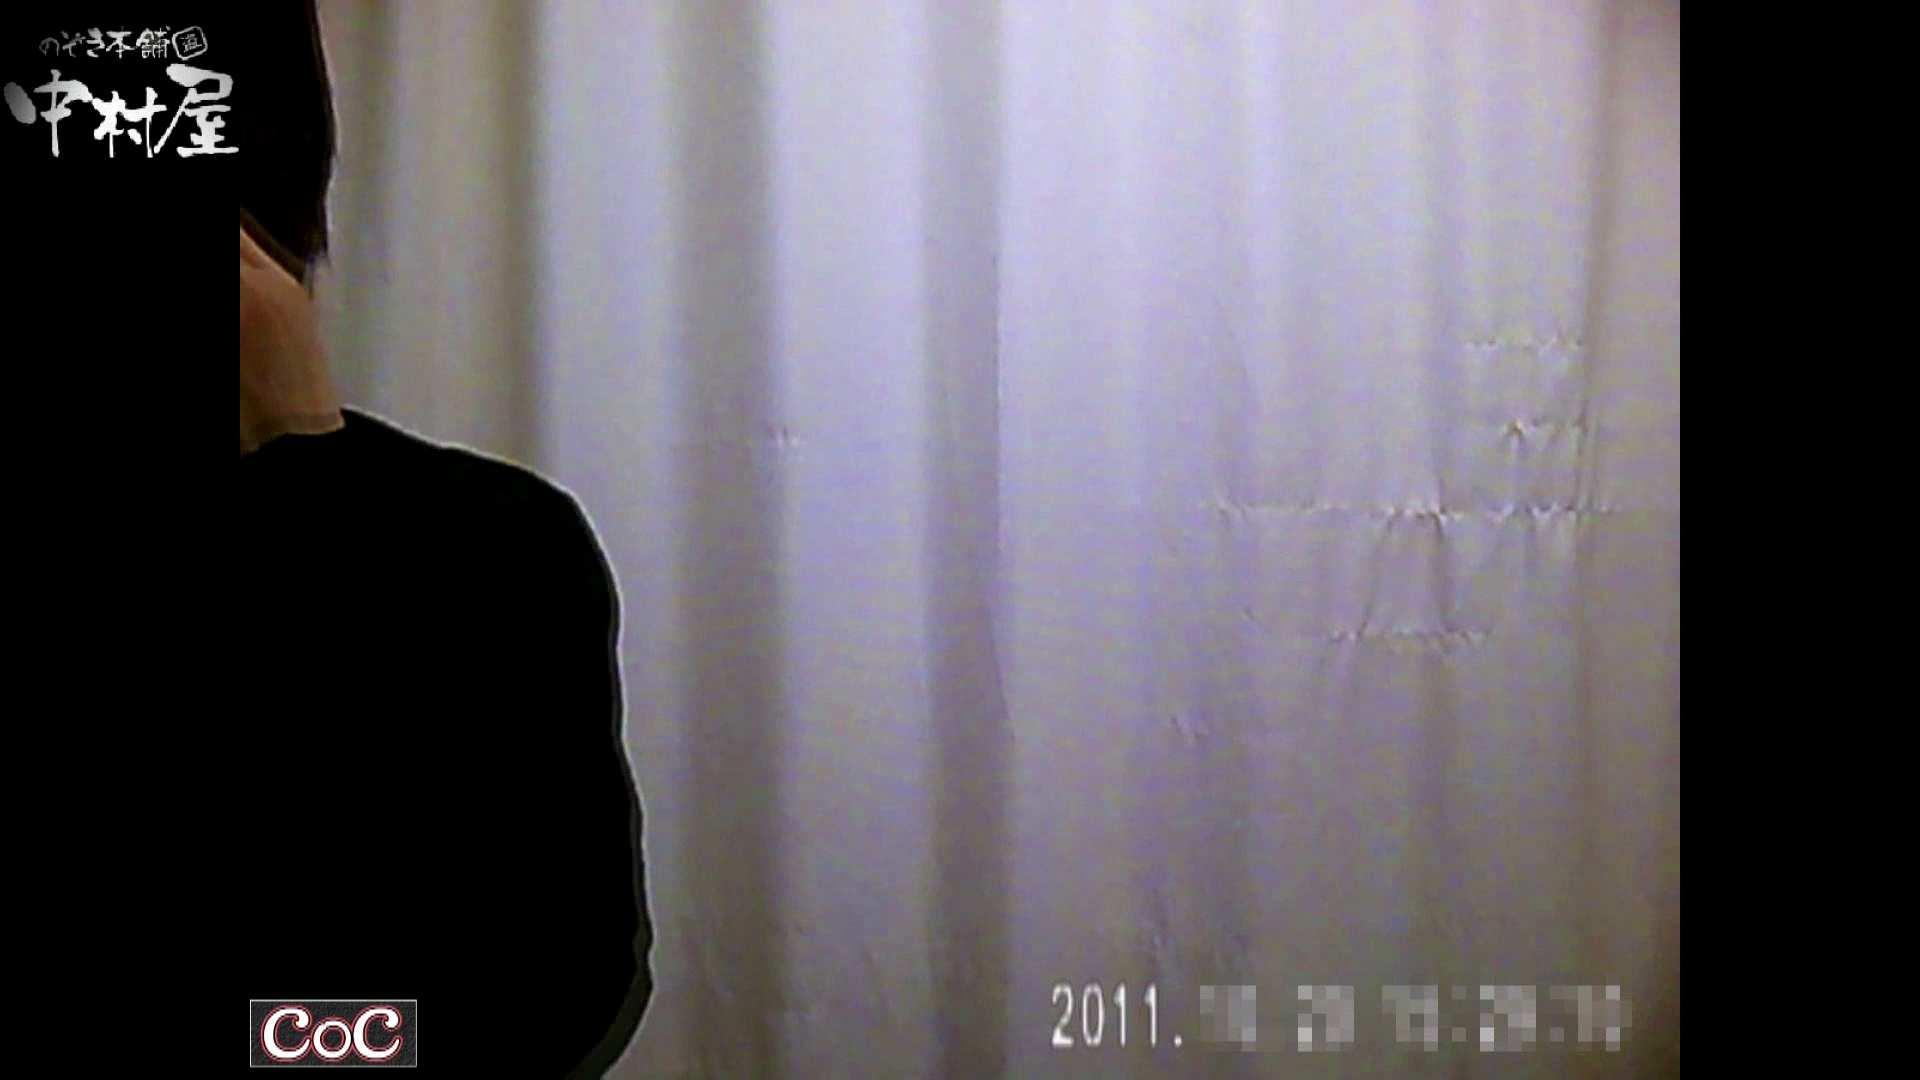 Doctor-X元医者による反抗vol.65 OLエロ画像 | 0  106PICs 21